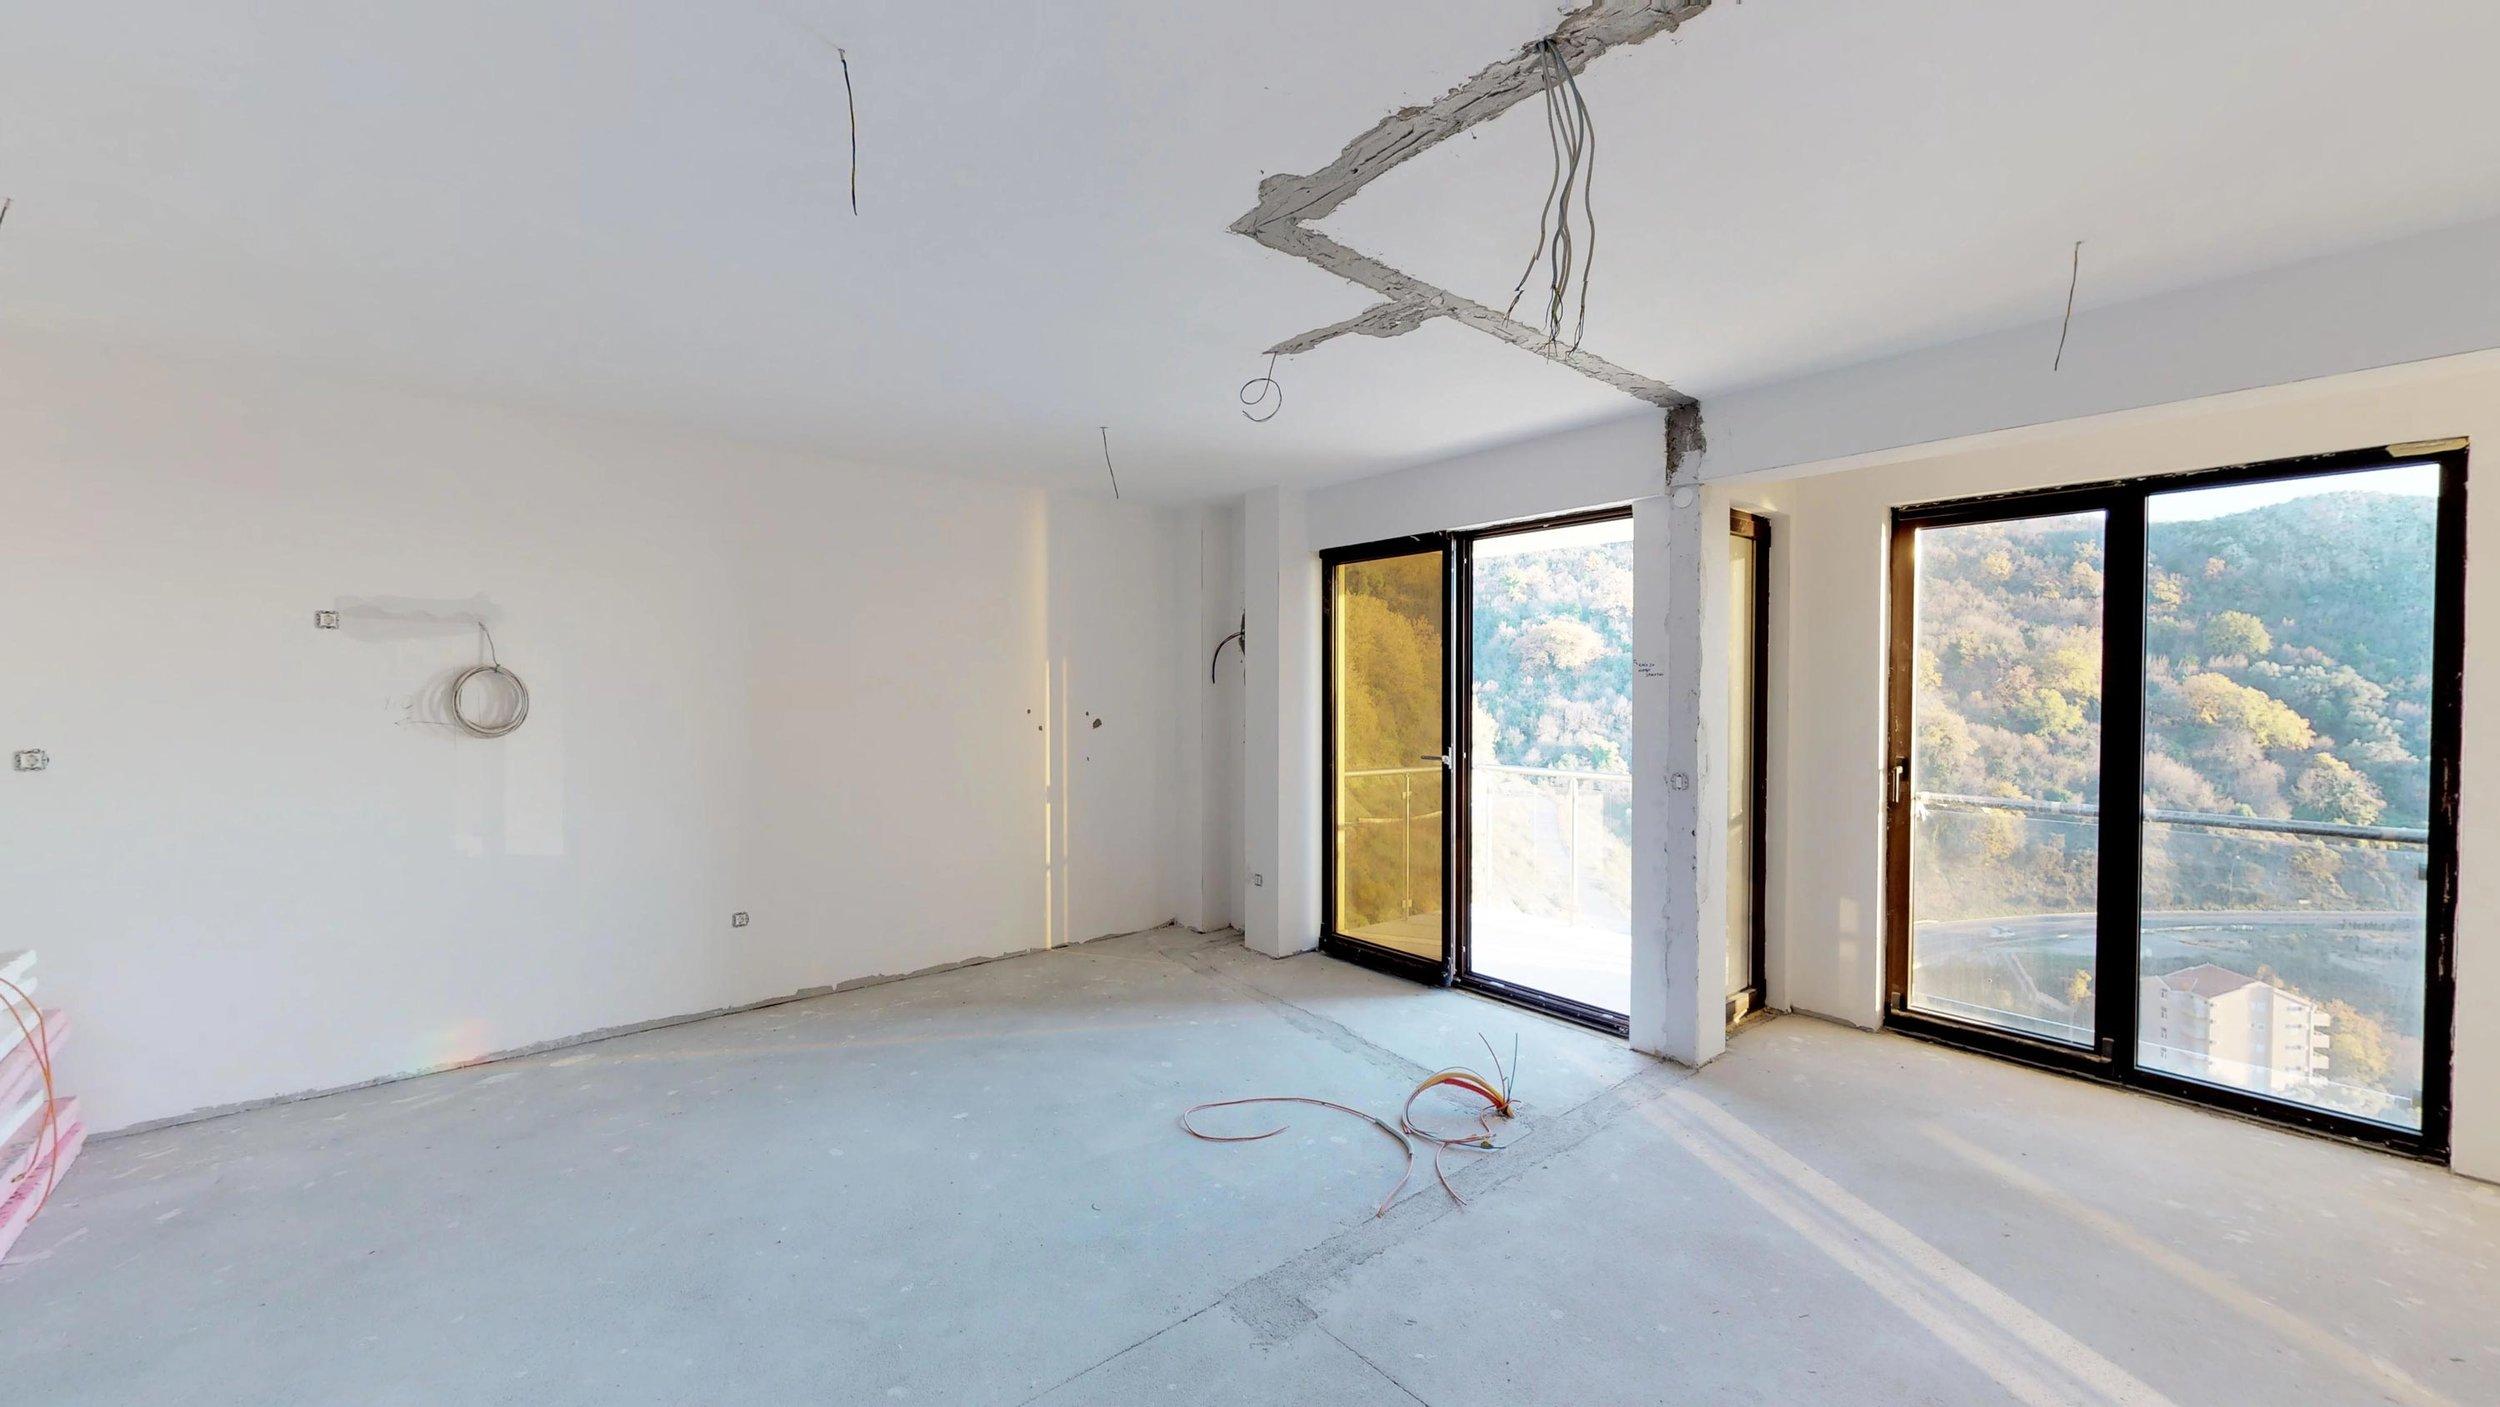 Penthouse-for-sale-in-rafailovice-Montenegro-(03).jpg